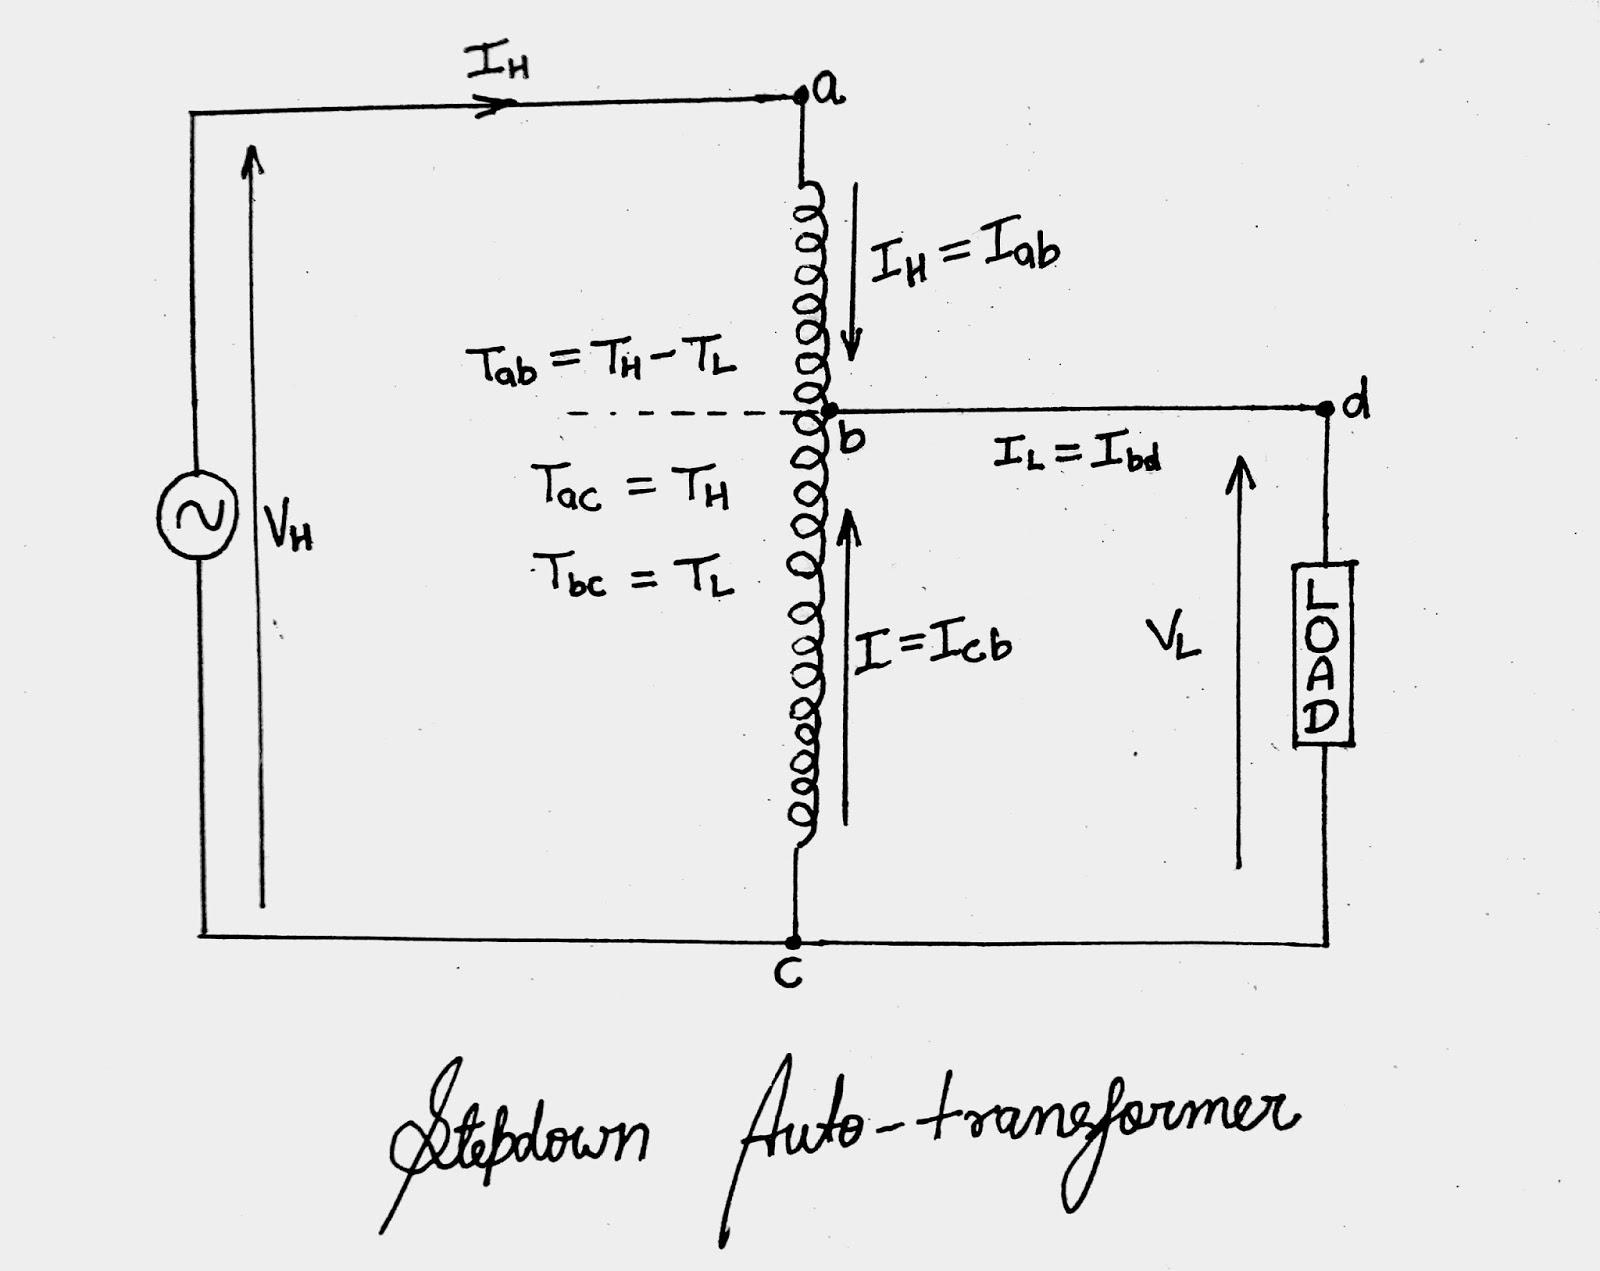 Auto Transformer Wiring Diagram International Tractor 674 Electrical Engineering Education Hub